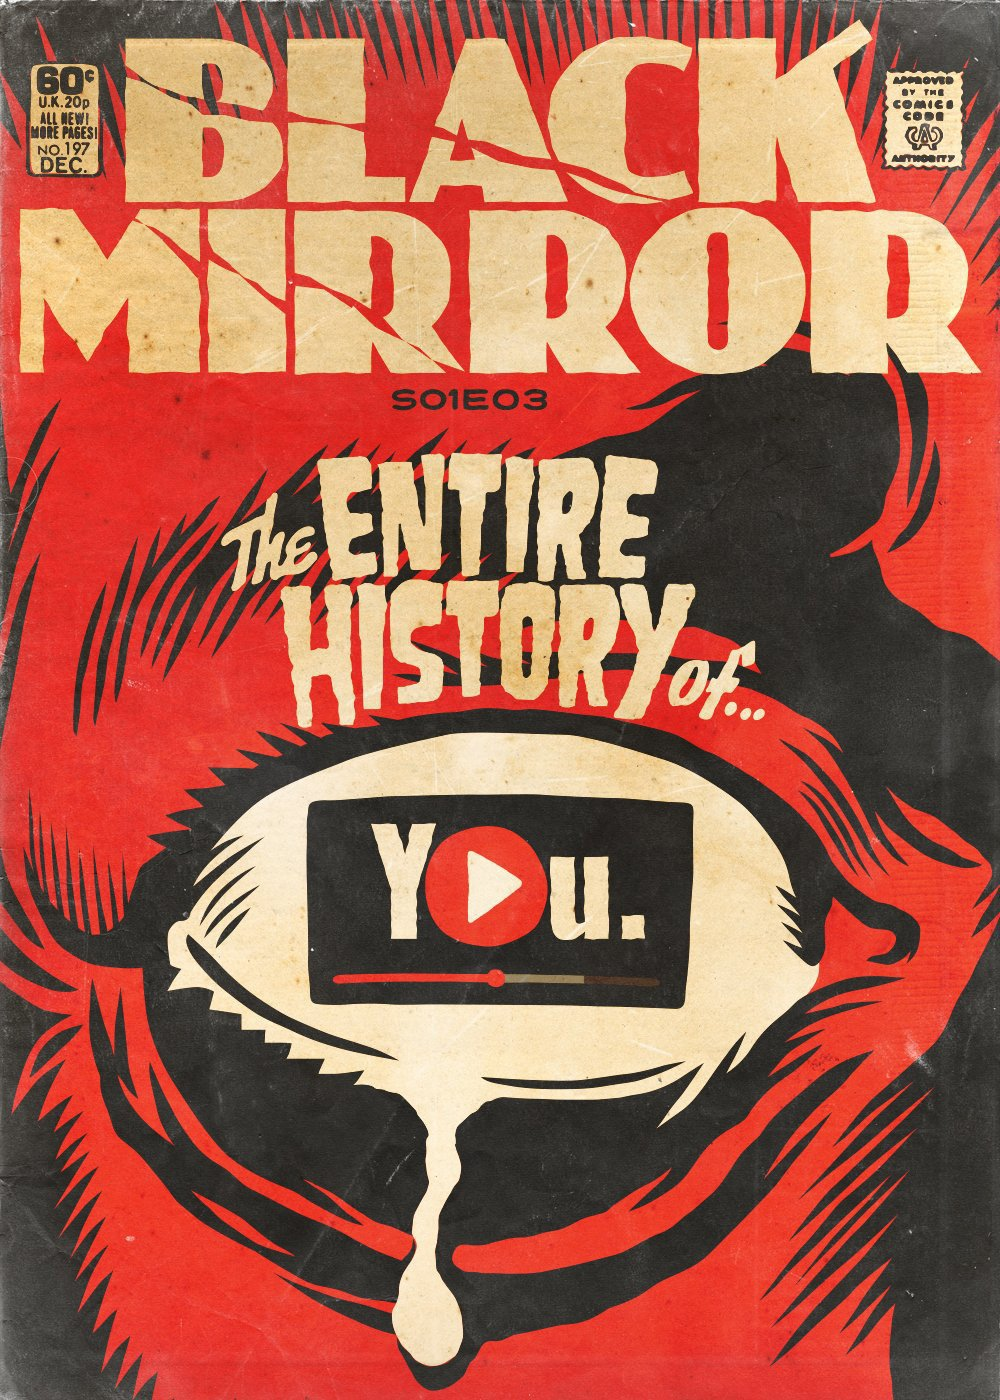 Book Cover Black Mirror : Artista transforma episódios de black mirror em capas no